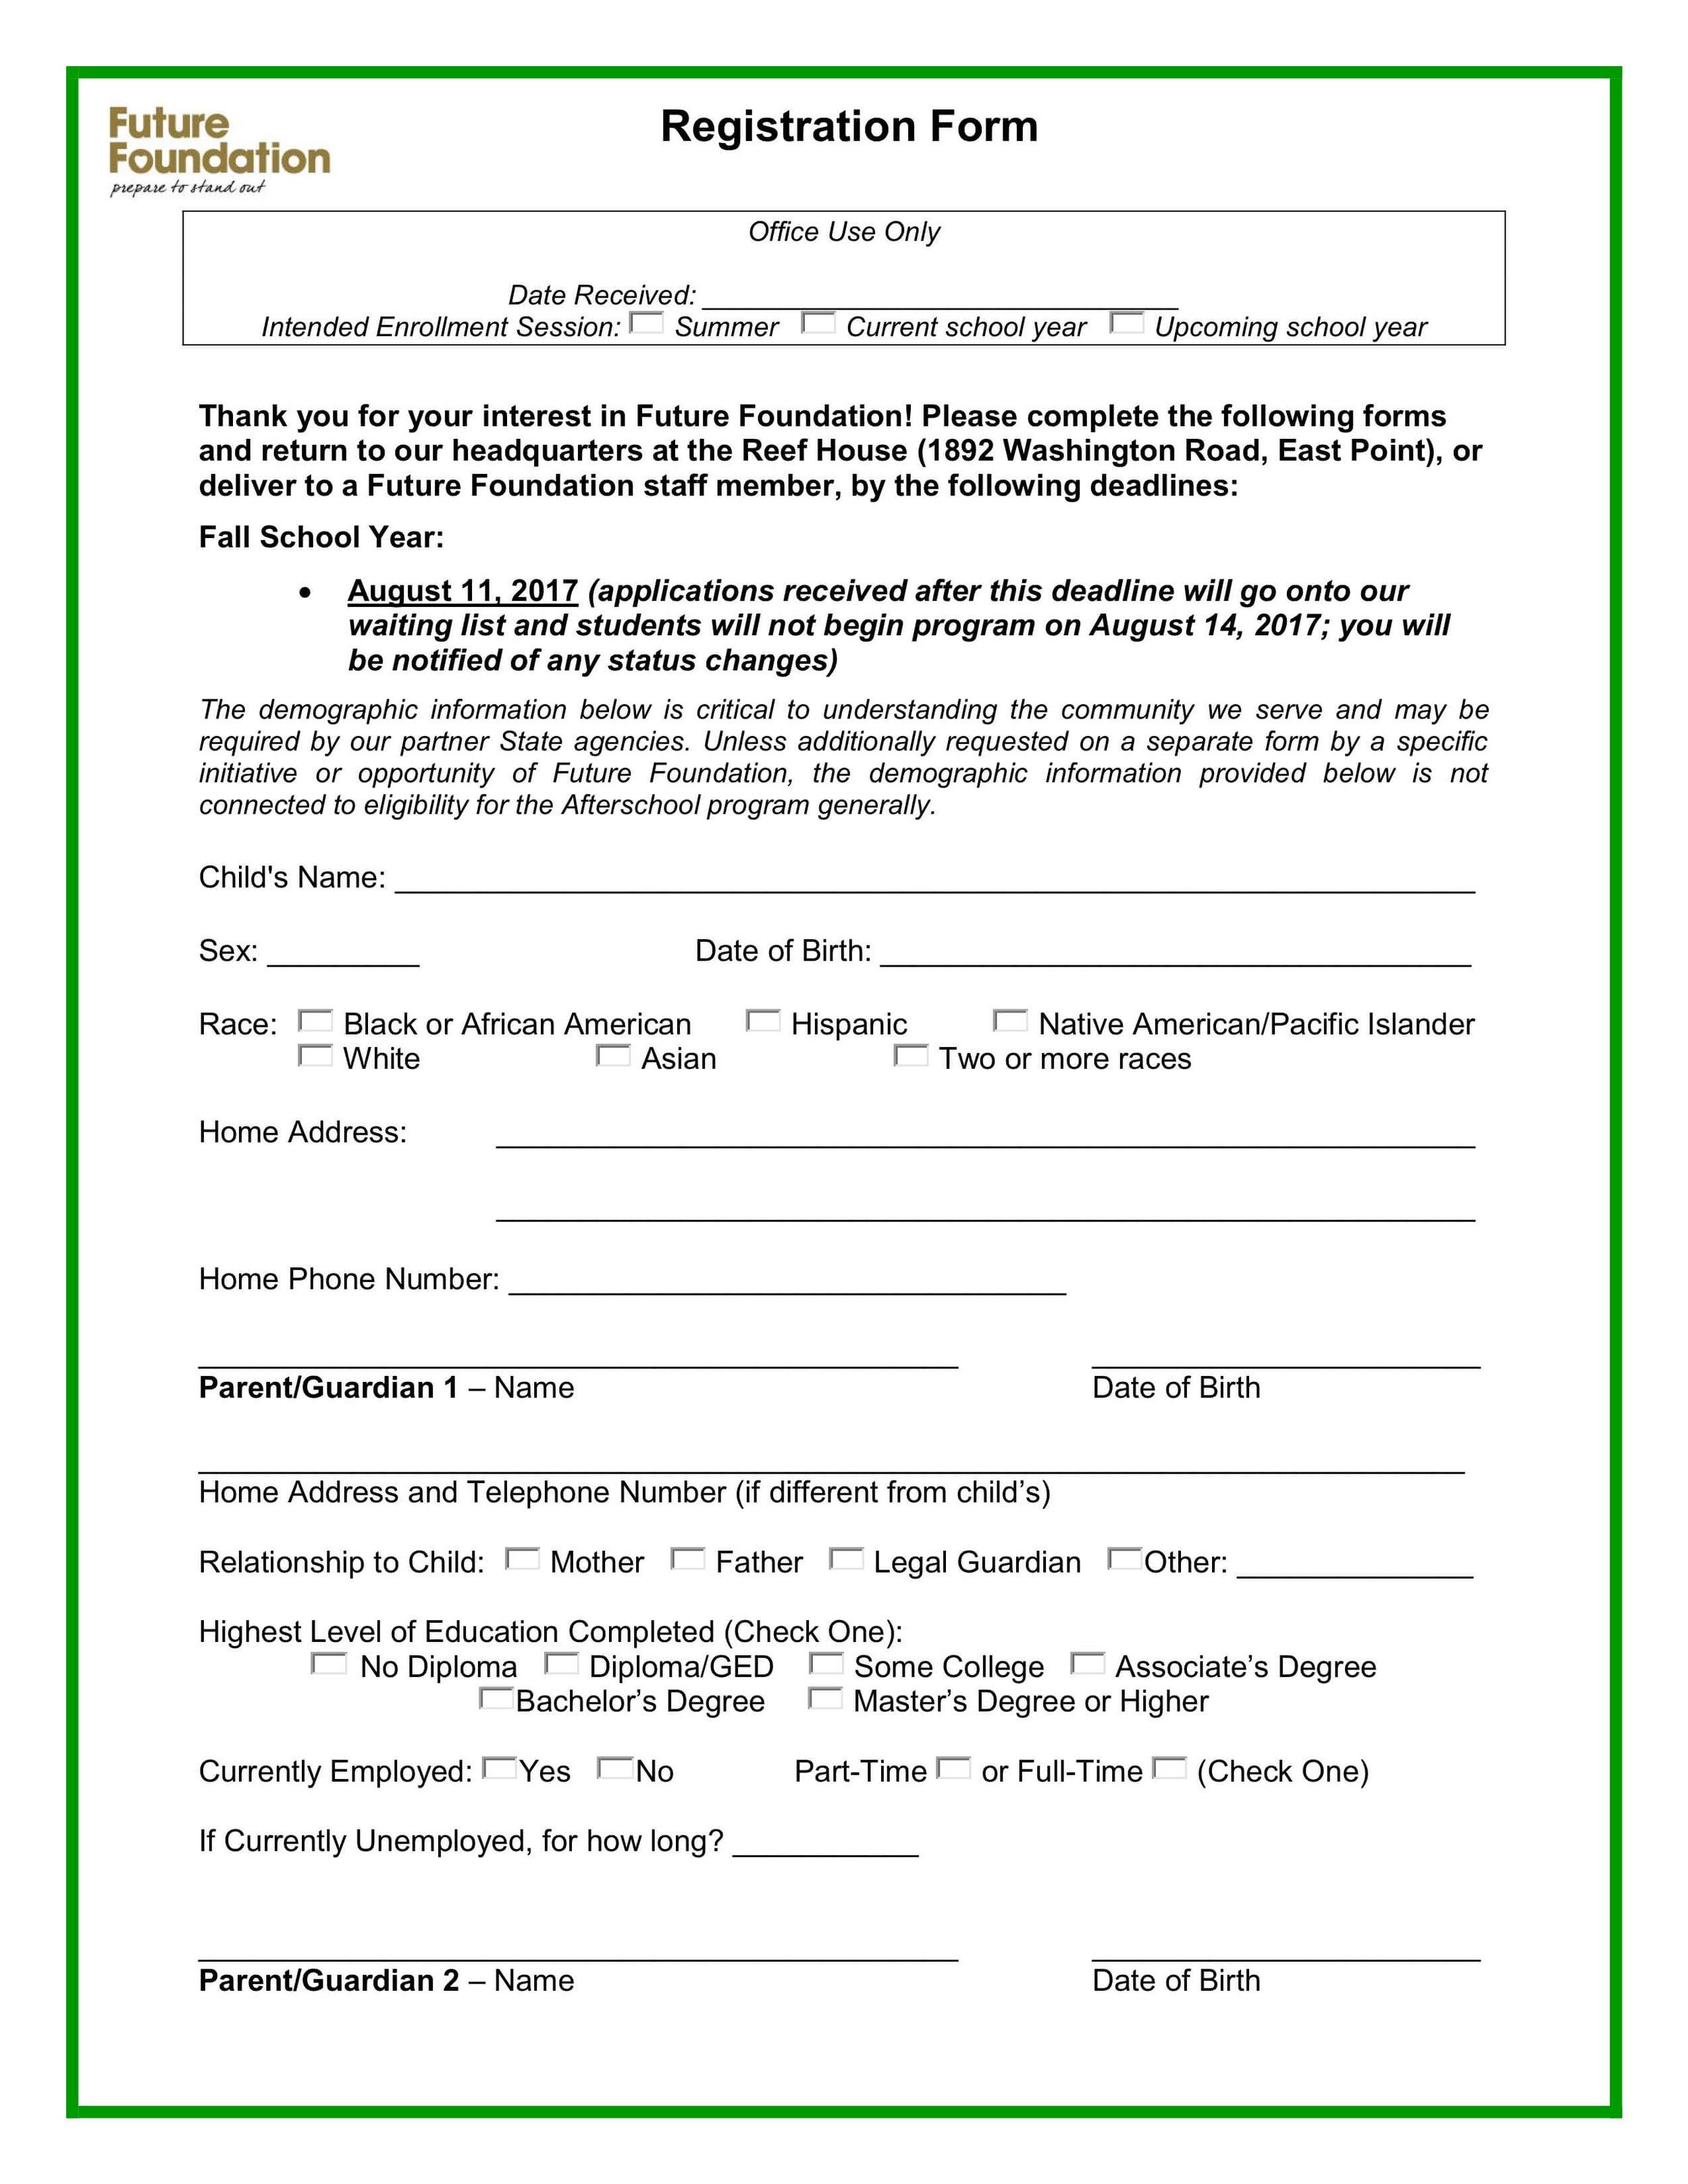 Future Foundation Registration Form -